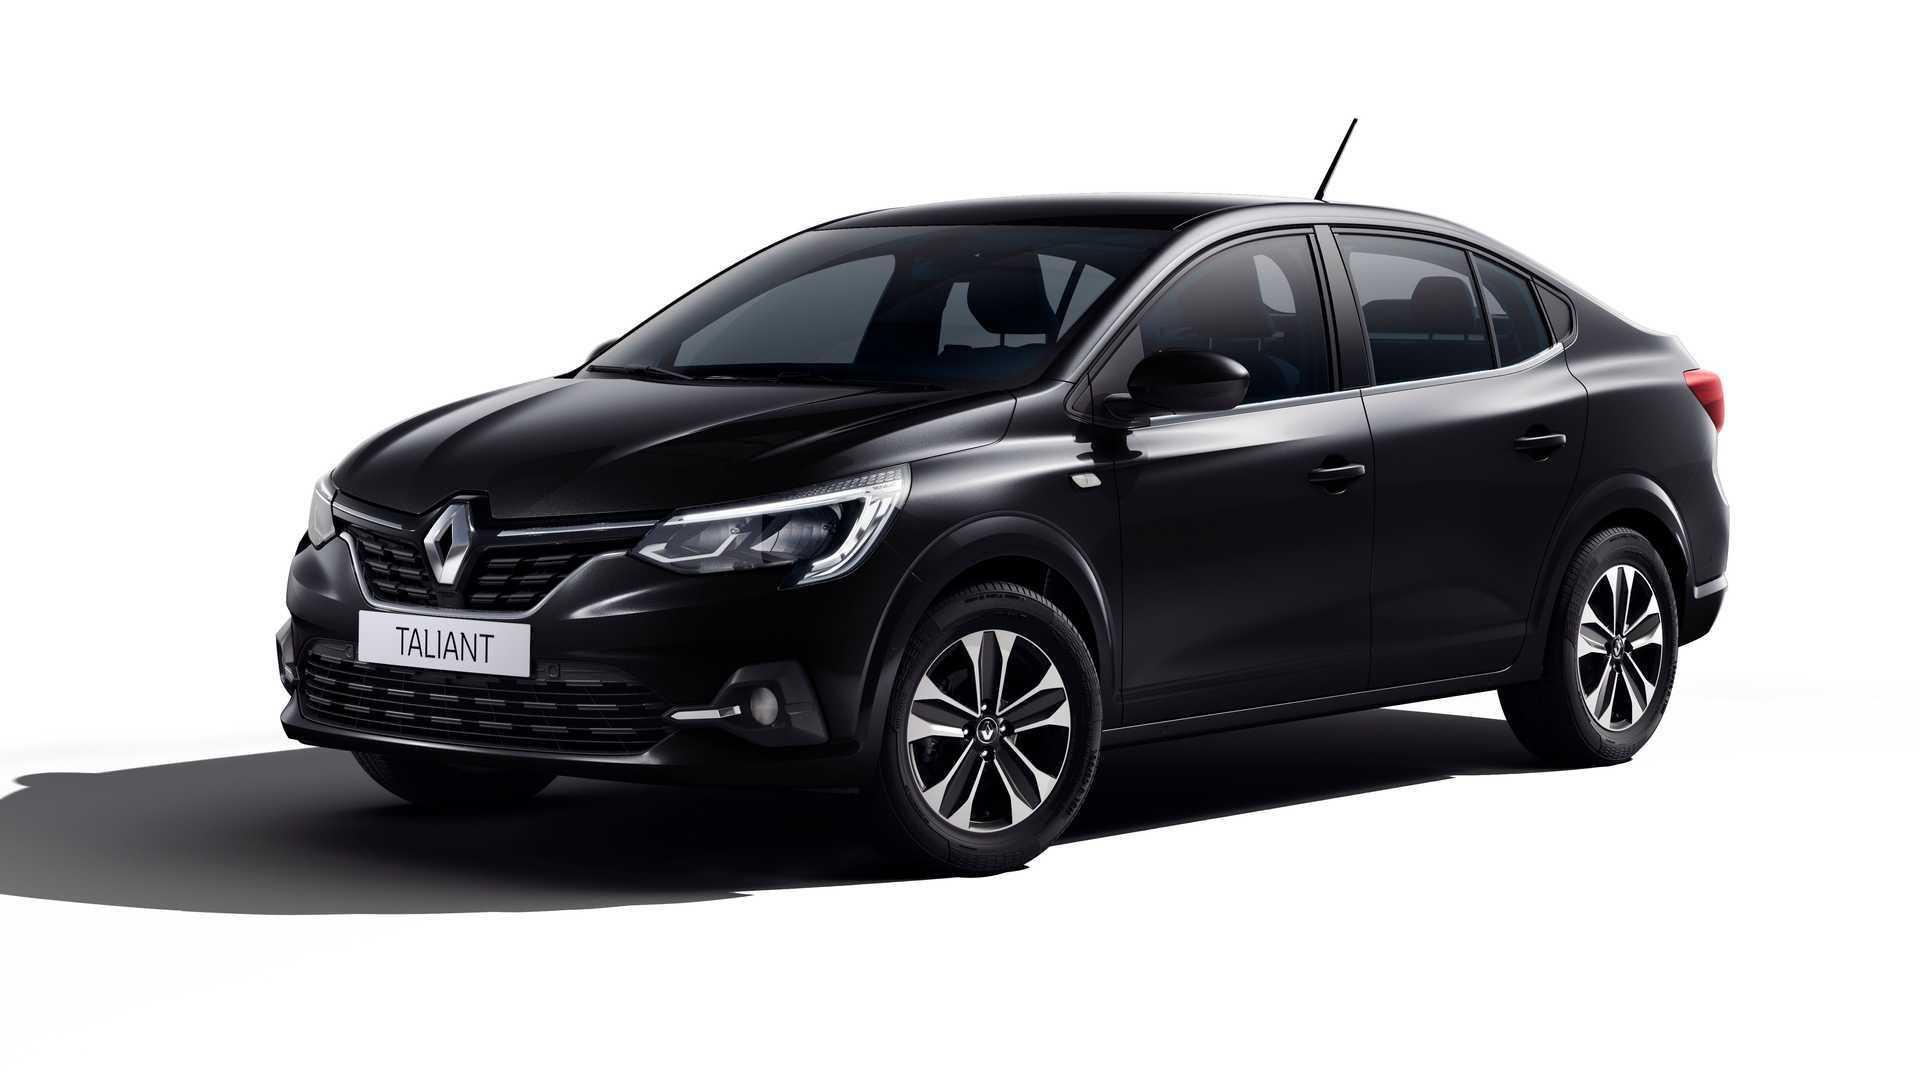 2021_Renault_Taliant-0004